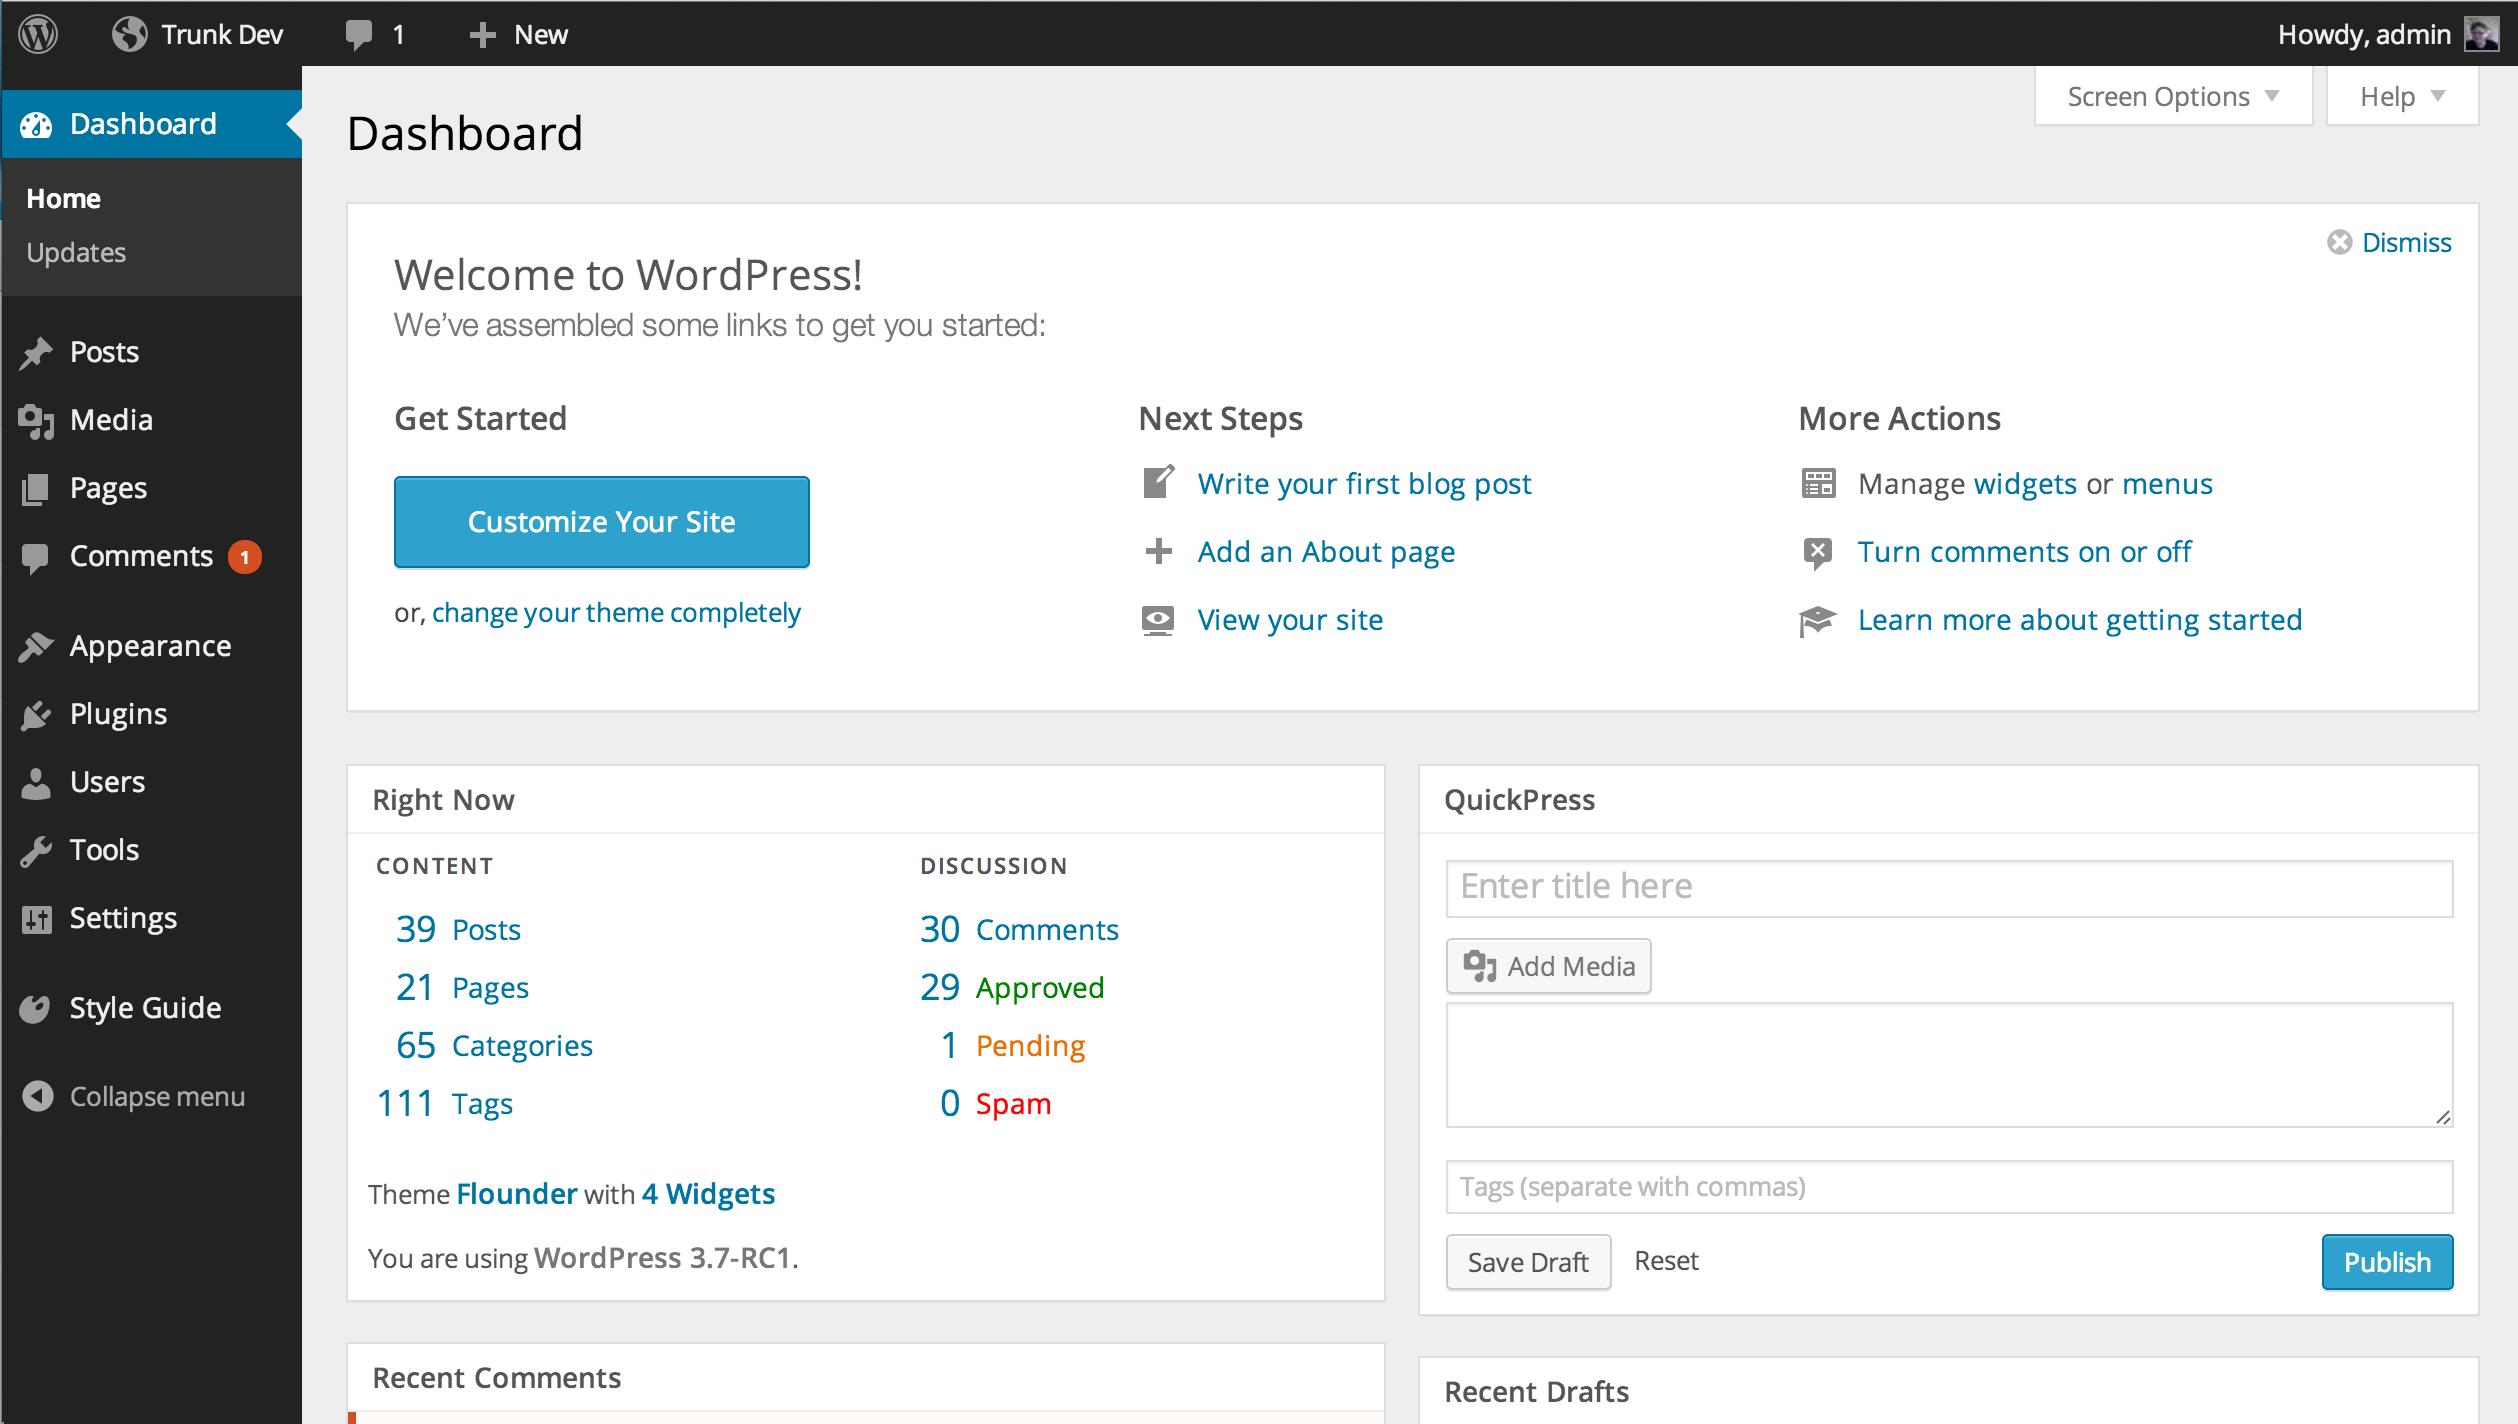 wordpress-admin-panel